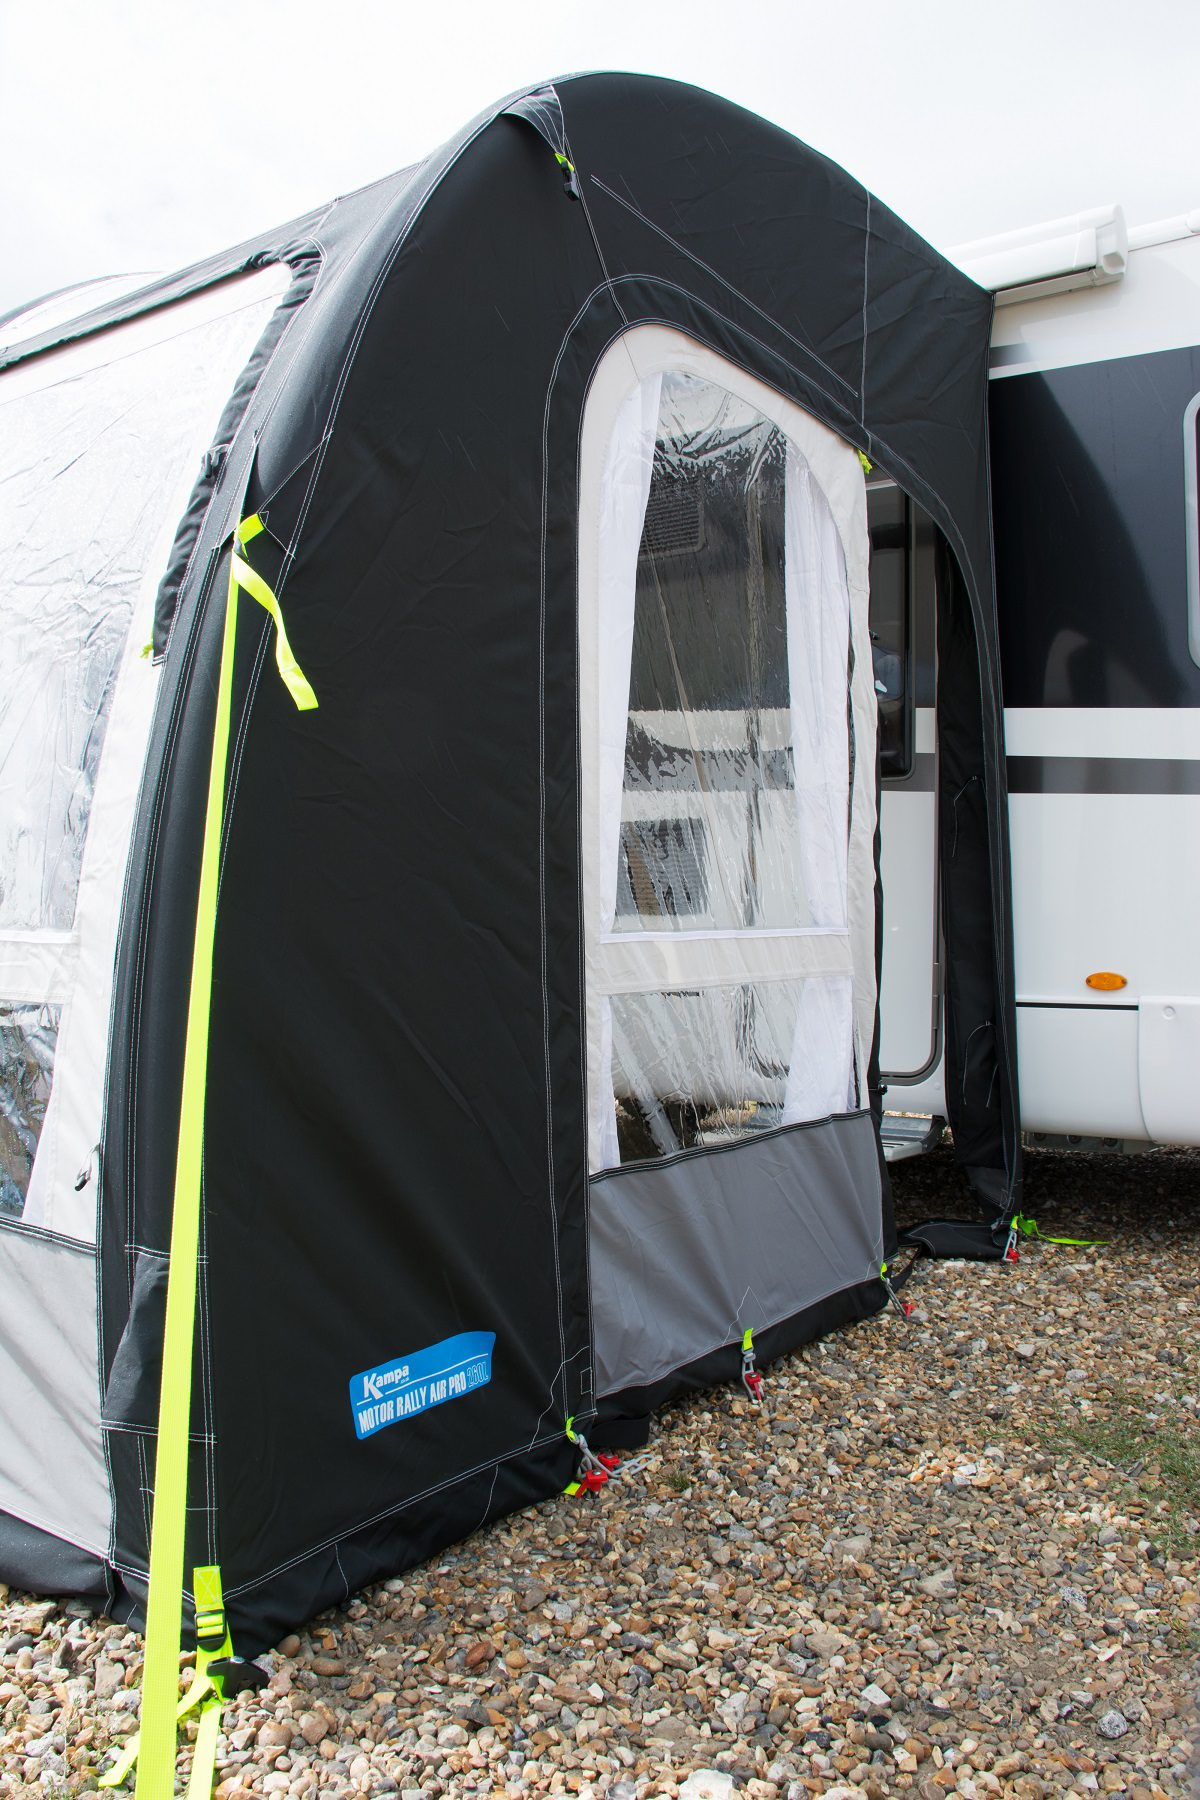 Kampa Motor Rally Air Pro 260 Xl Motor Home Awning 2016 Motorhome Awning Norwich Camping